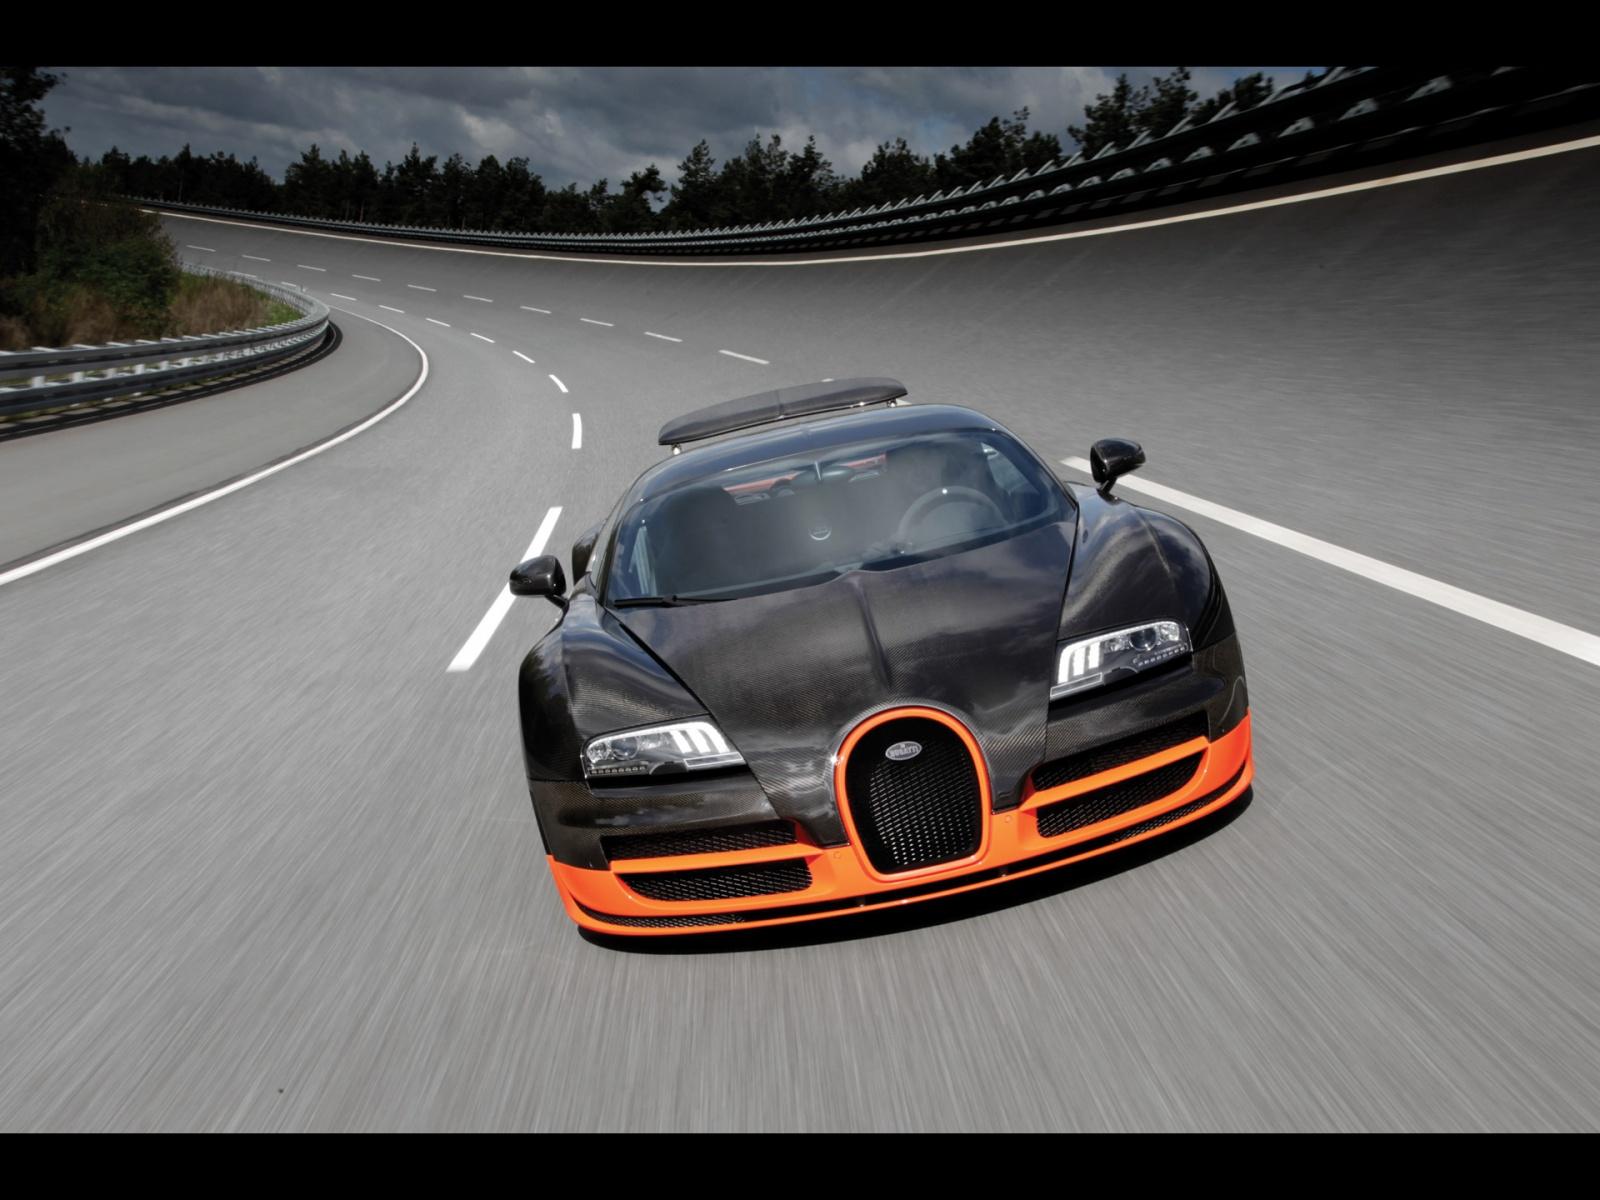 Bugatti Veyron Super Sport Car Pictures